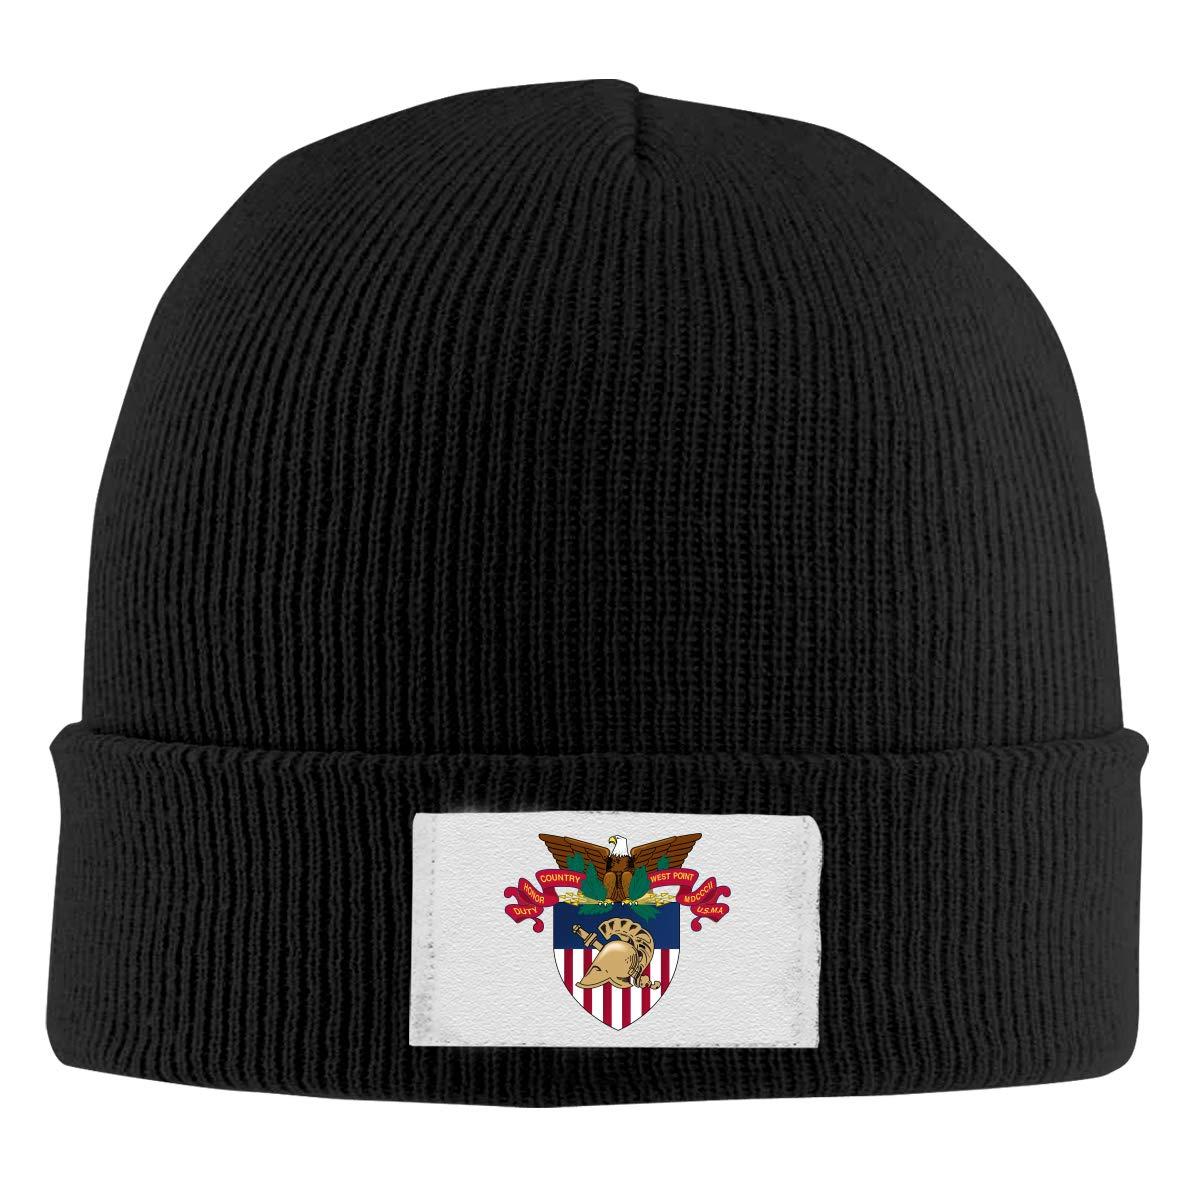 Unisex Stylish Slouch Beanie Hats Black West Point Military Academy West Point Academy Logo Top Level Beanie Men Women